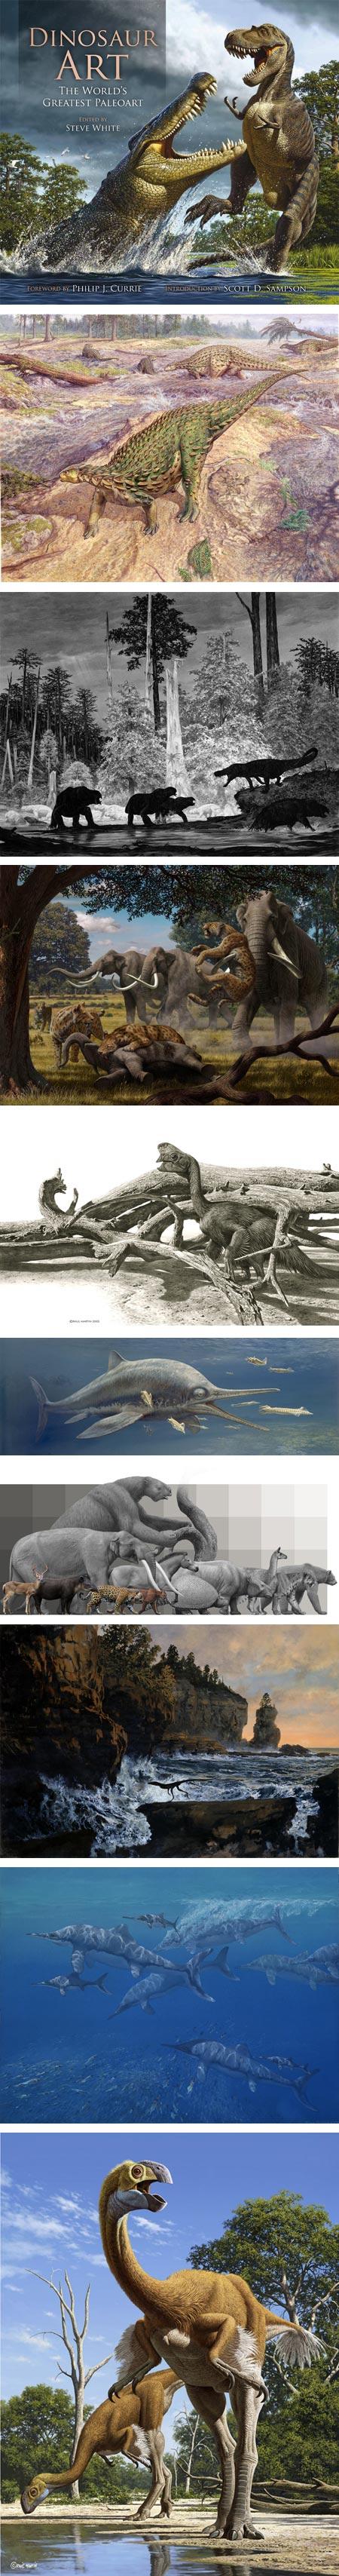 Dinosaur Art: The World's Greatest Paleoart:  Raul Martin, John Sibbick, Douglas Henderson, Mauricio Antón, Raul Martin, John Sibbick, Mauricio Antón, Douglas Henderson, John Sibbick, Raul Martin